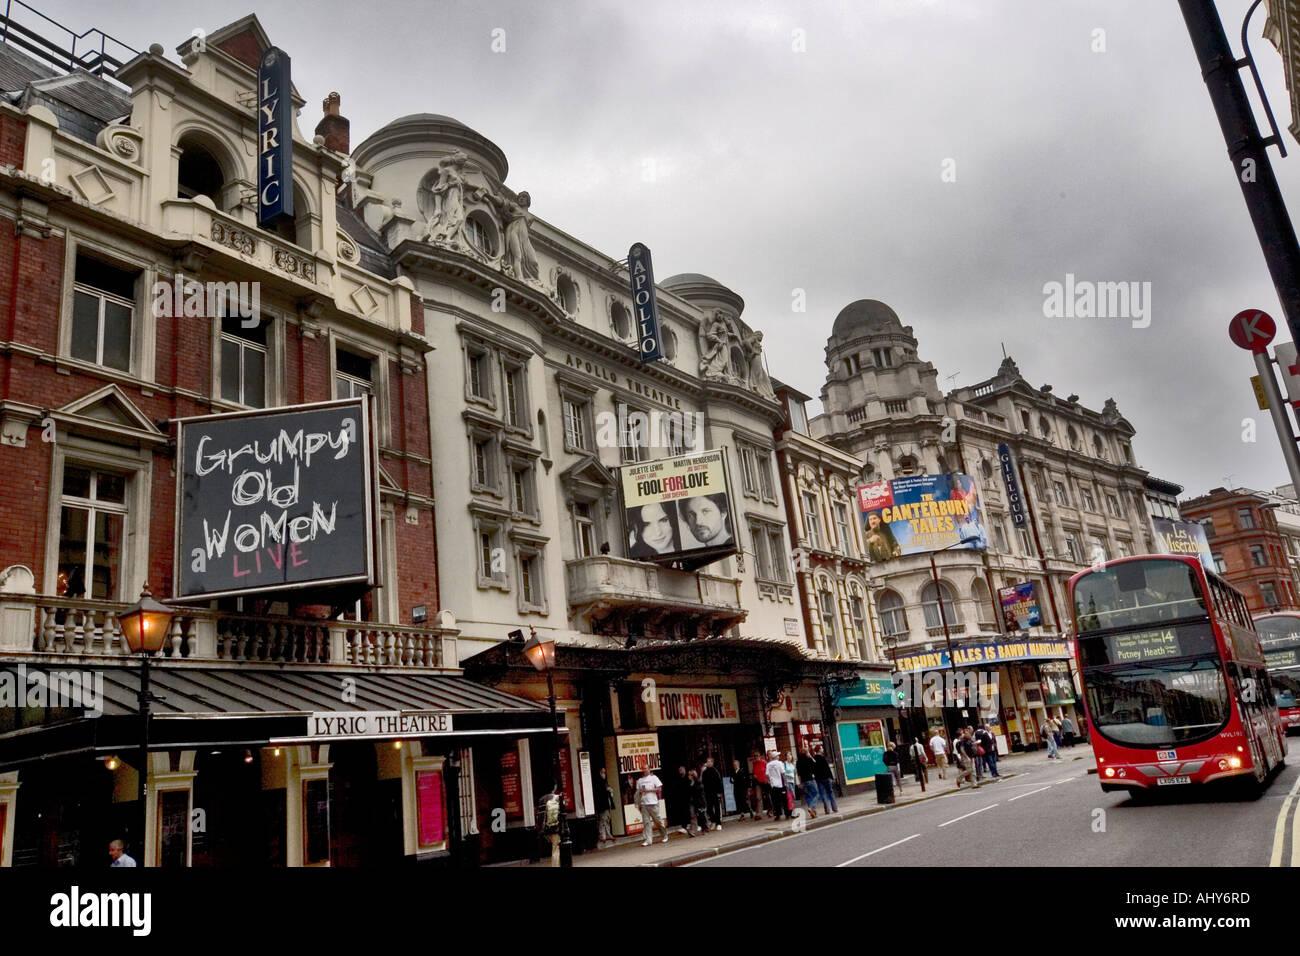 Lyric Apollo and Gielgud theatres on Shaftesbury Avenue London - Stock Image